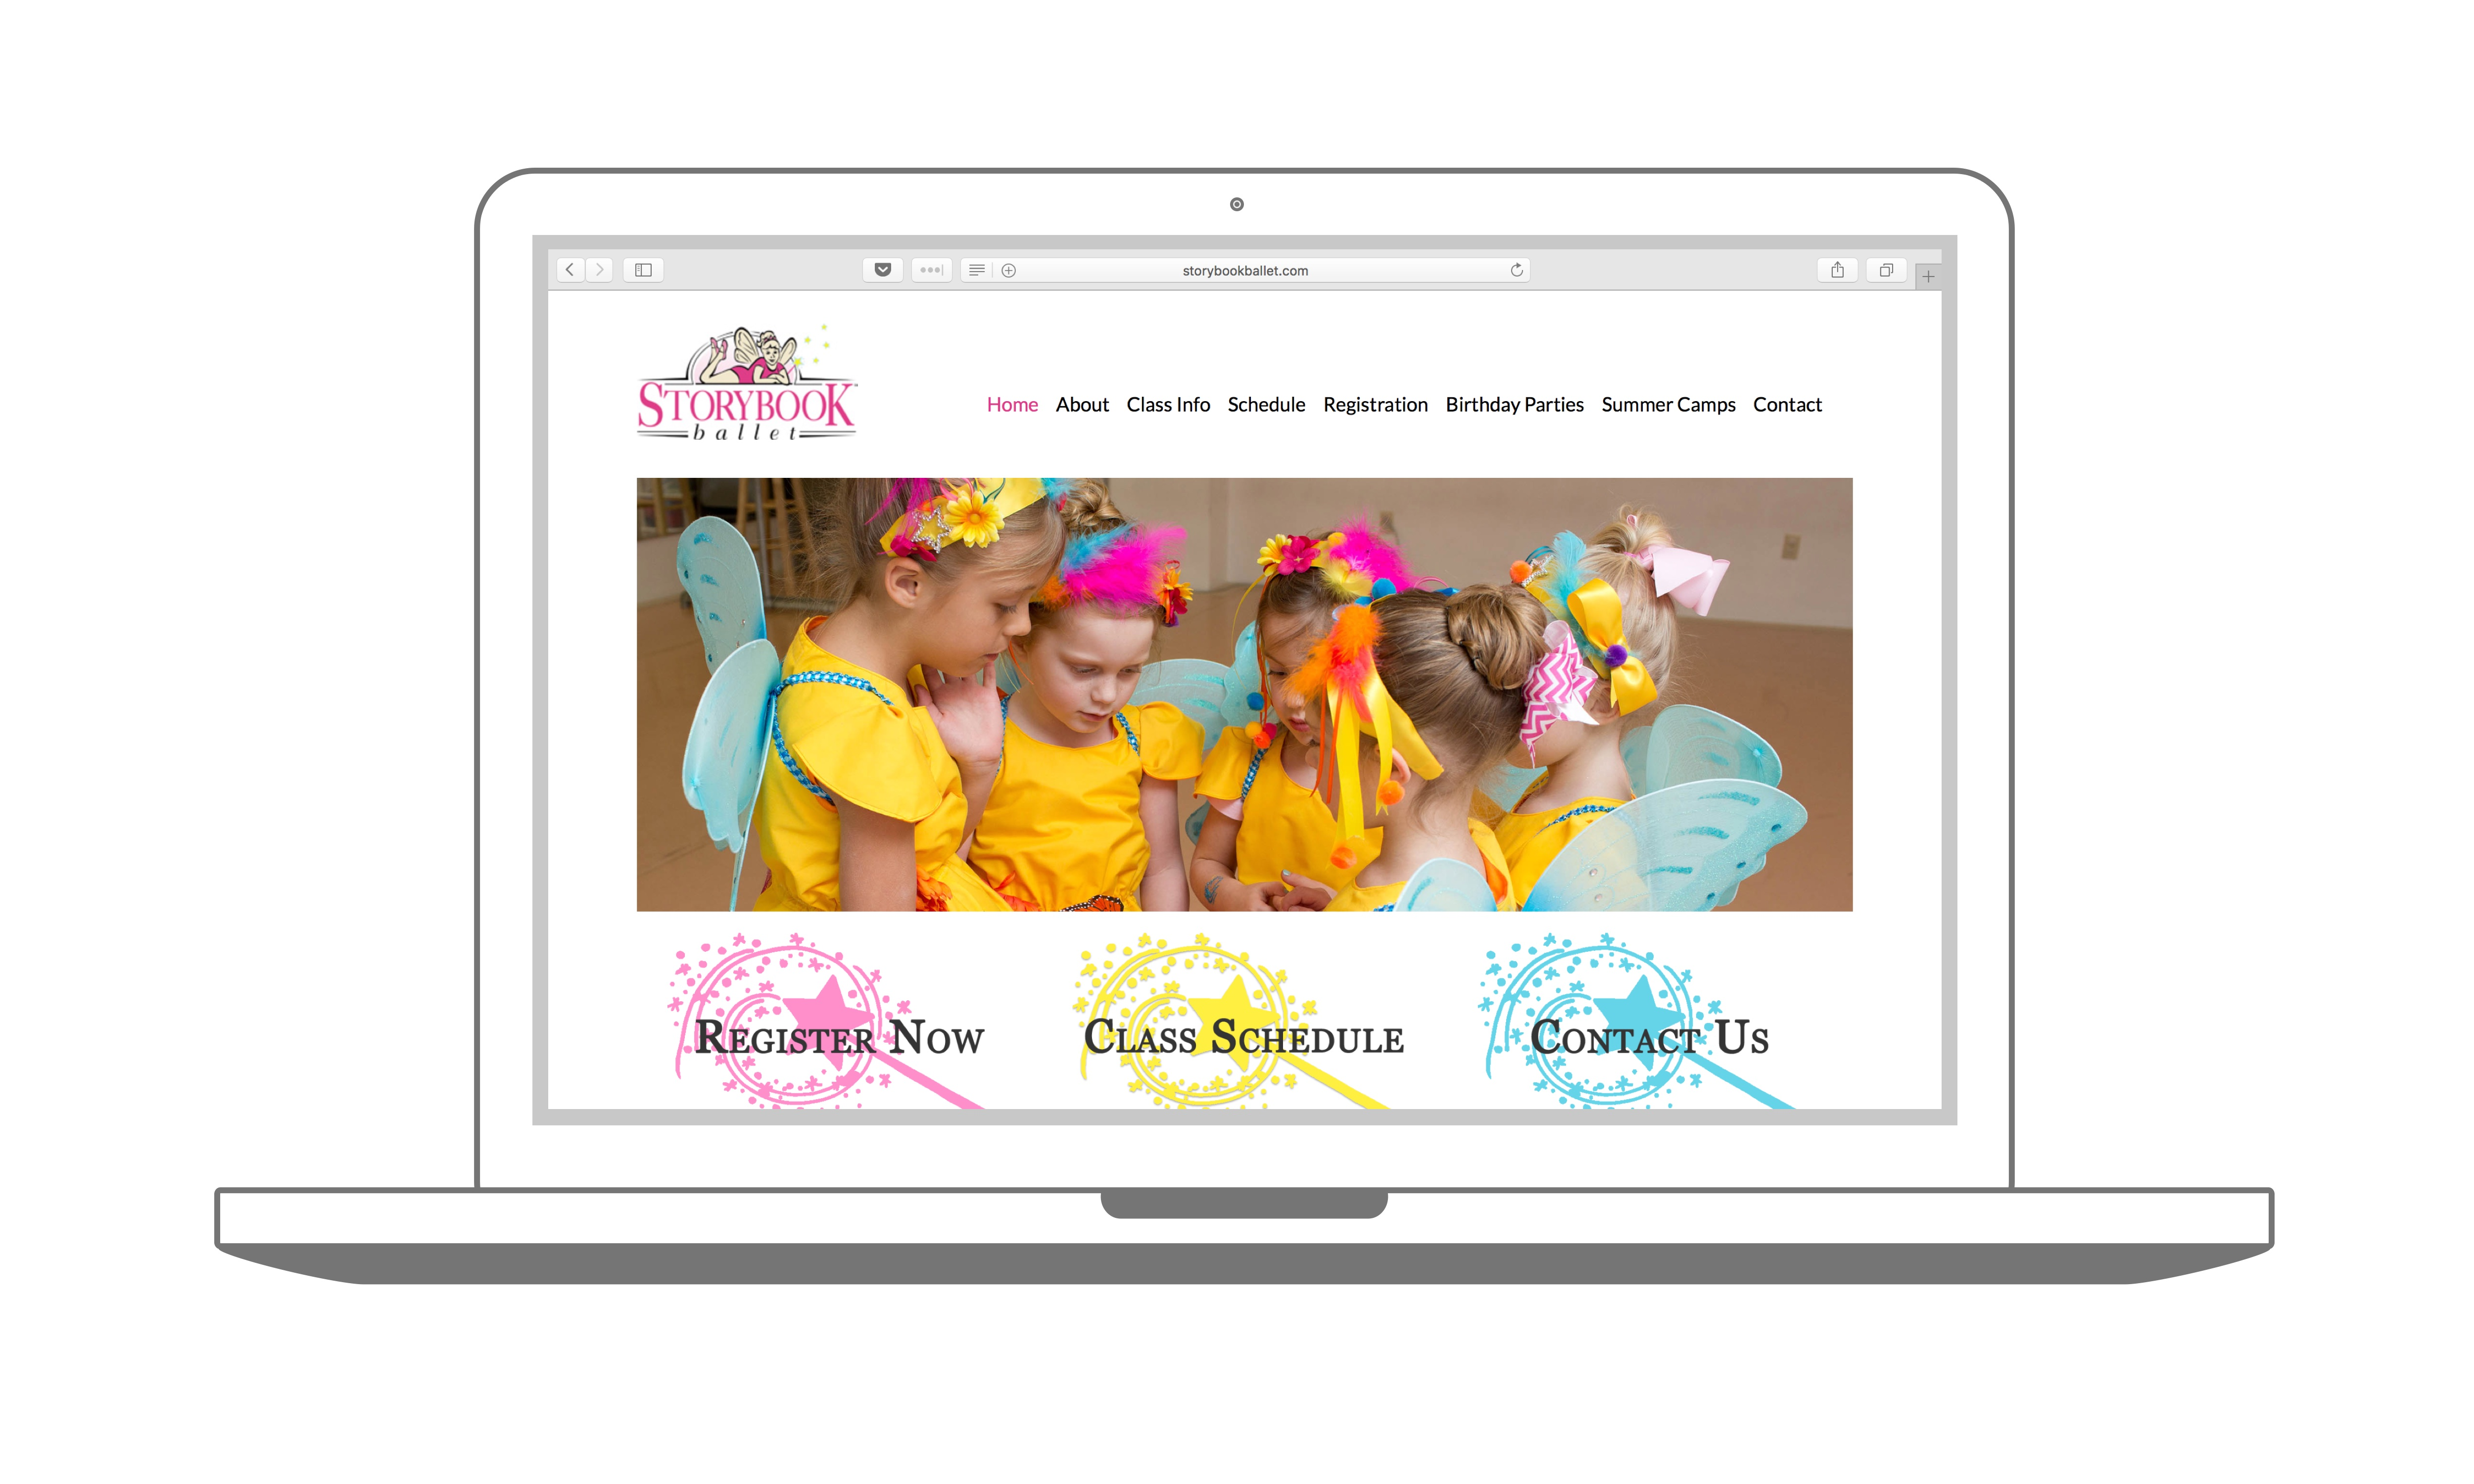 Storybook Ballet Web Design Homepage Sample